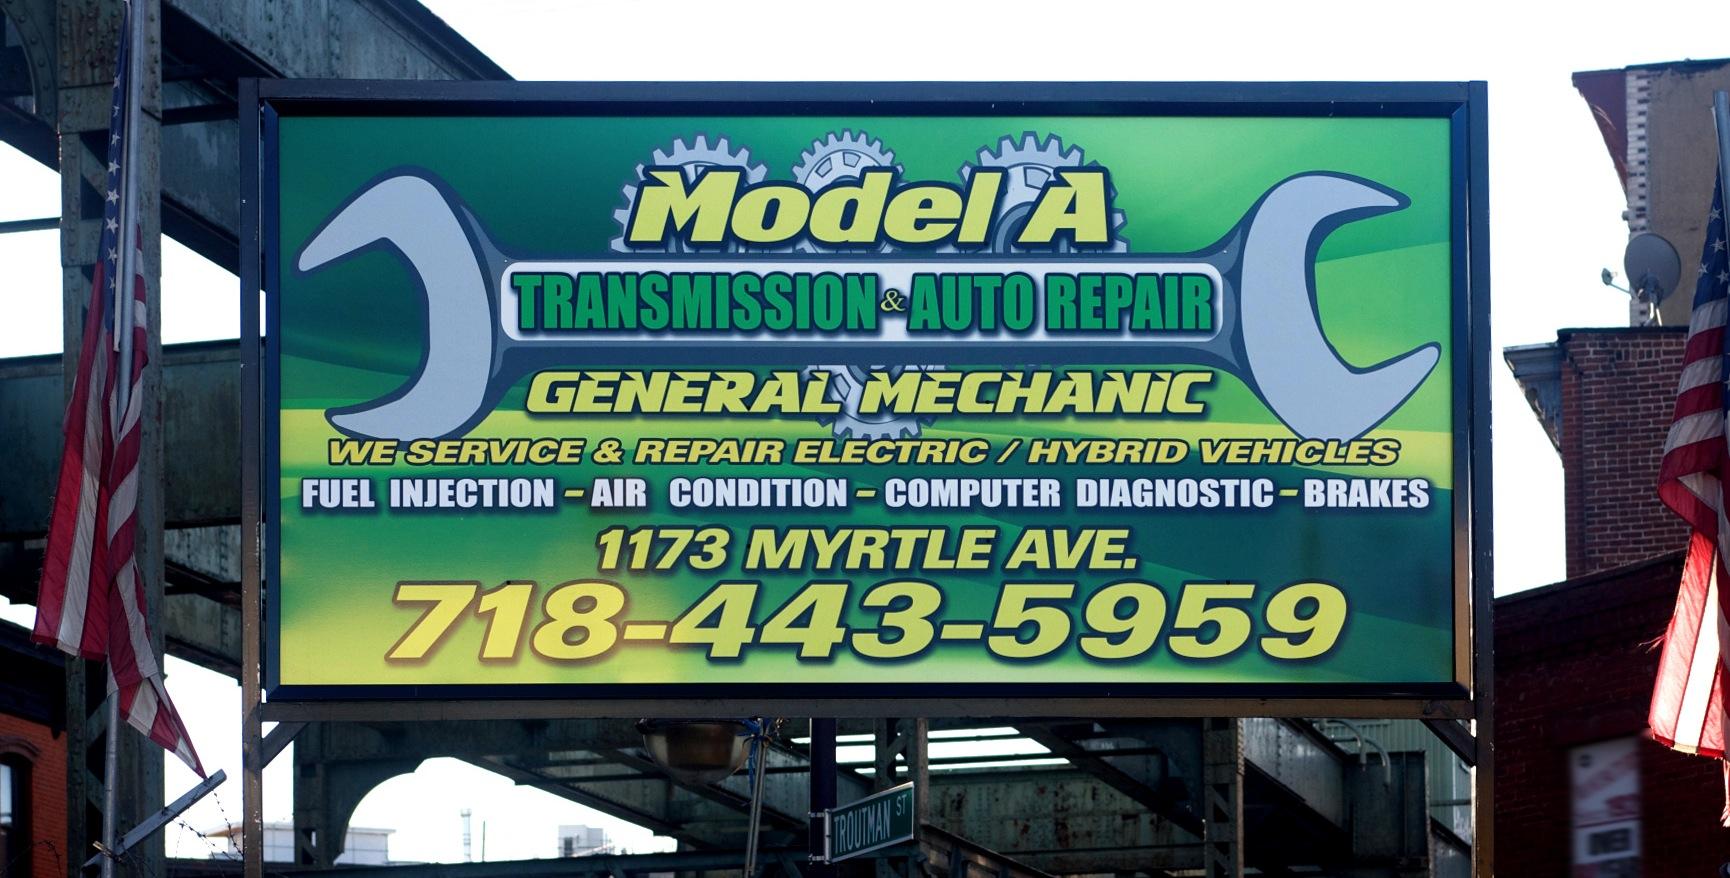 Automotive Repair Signs : Model a transmission auto repair